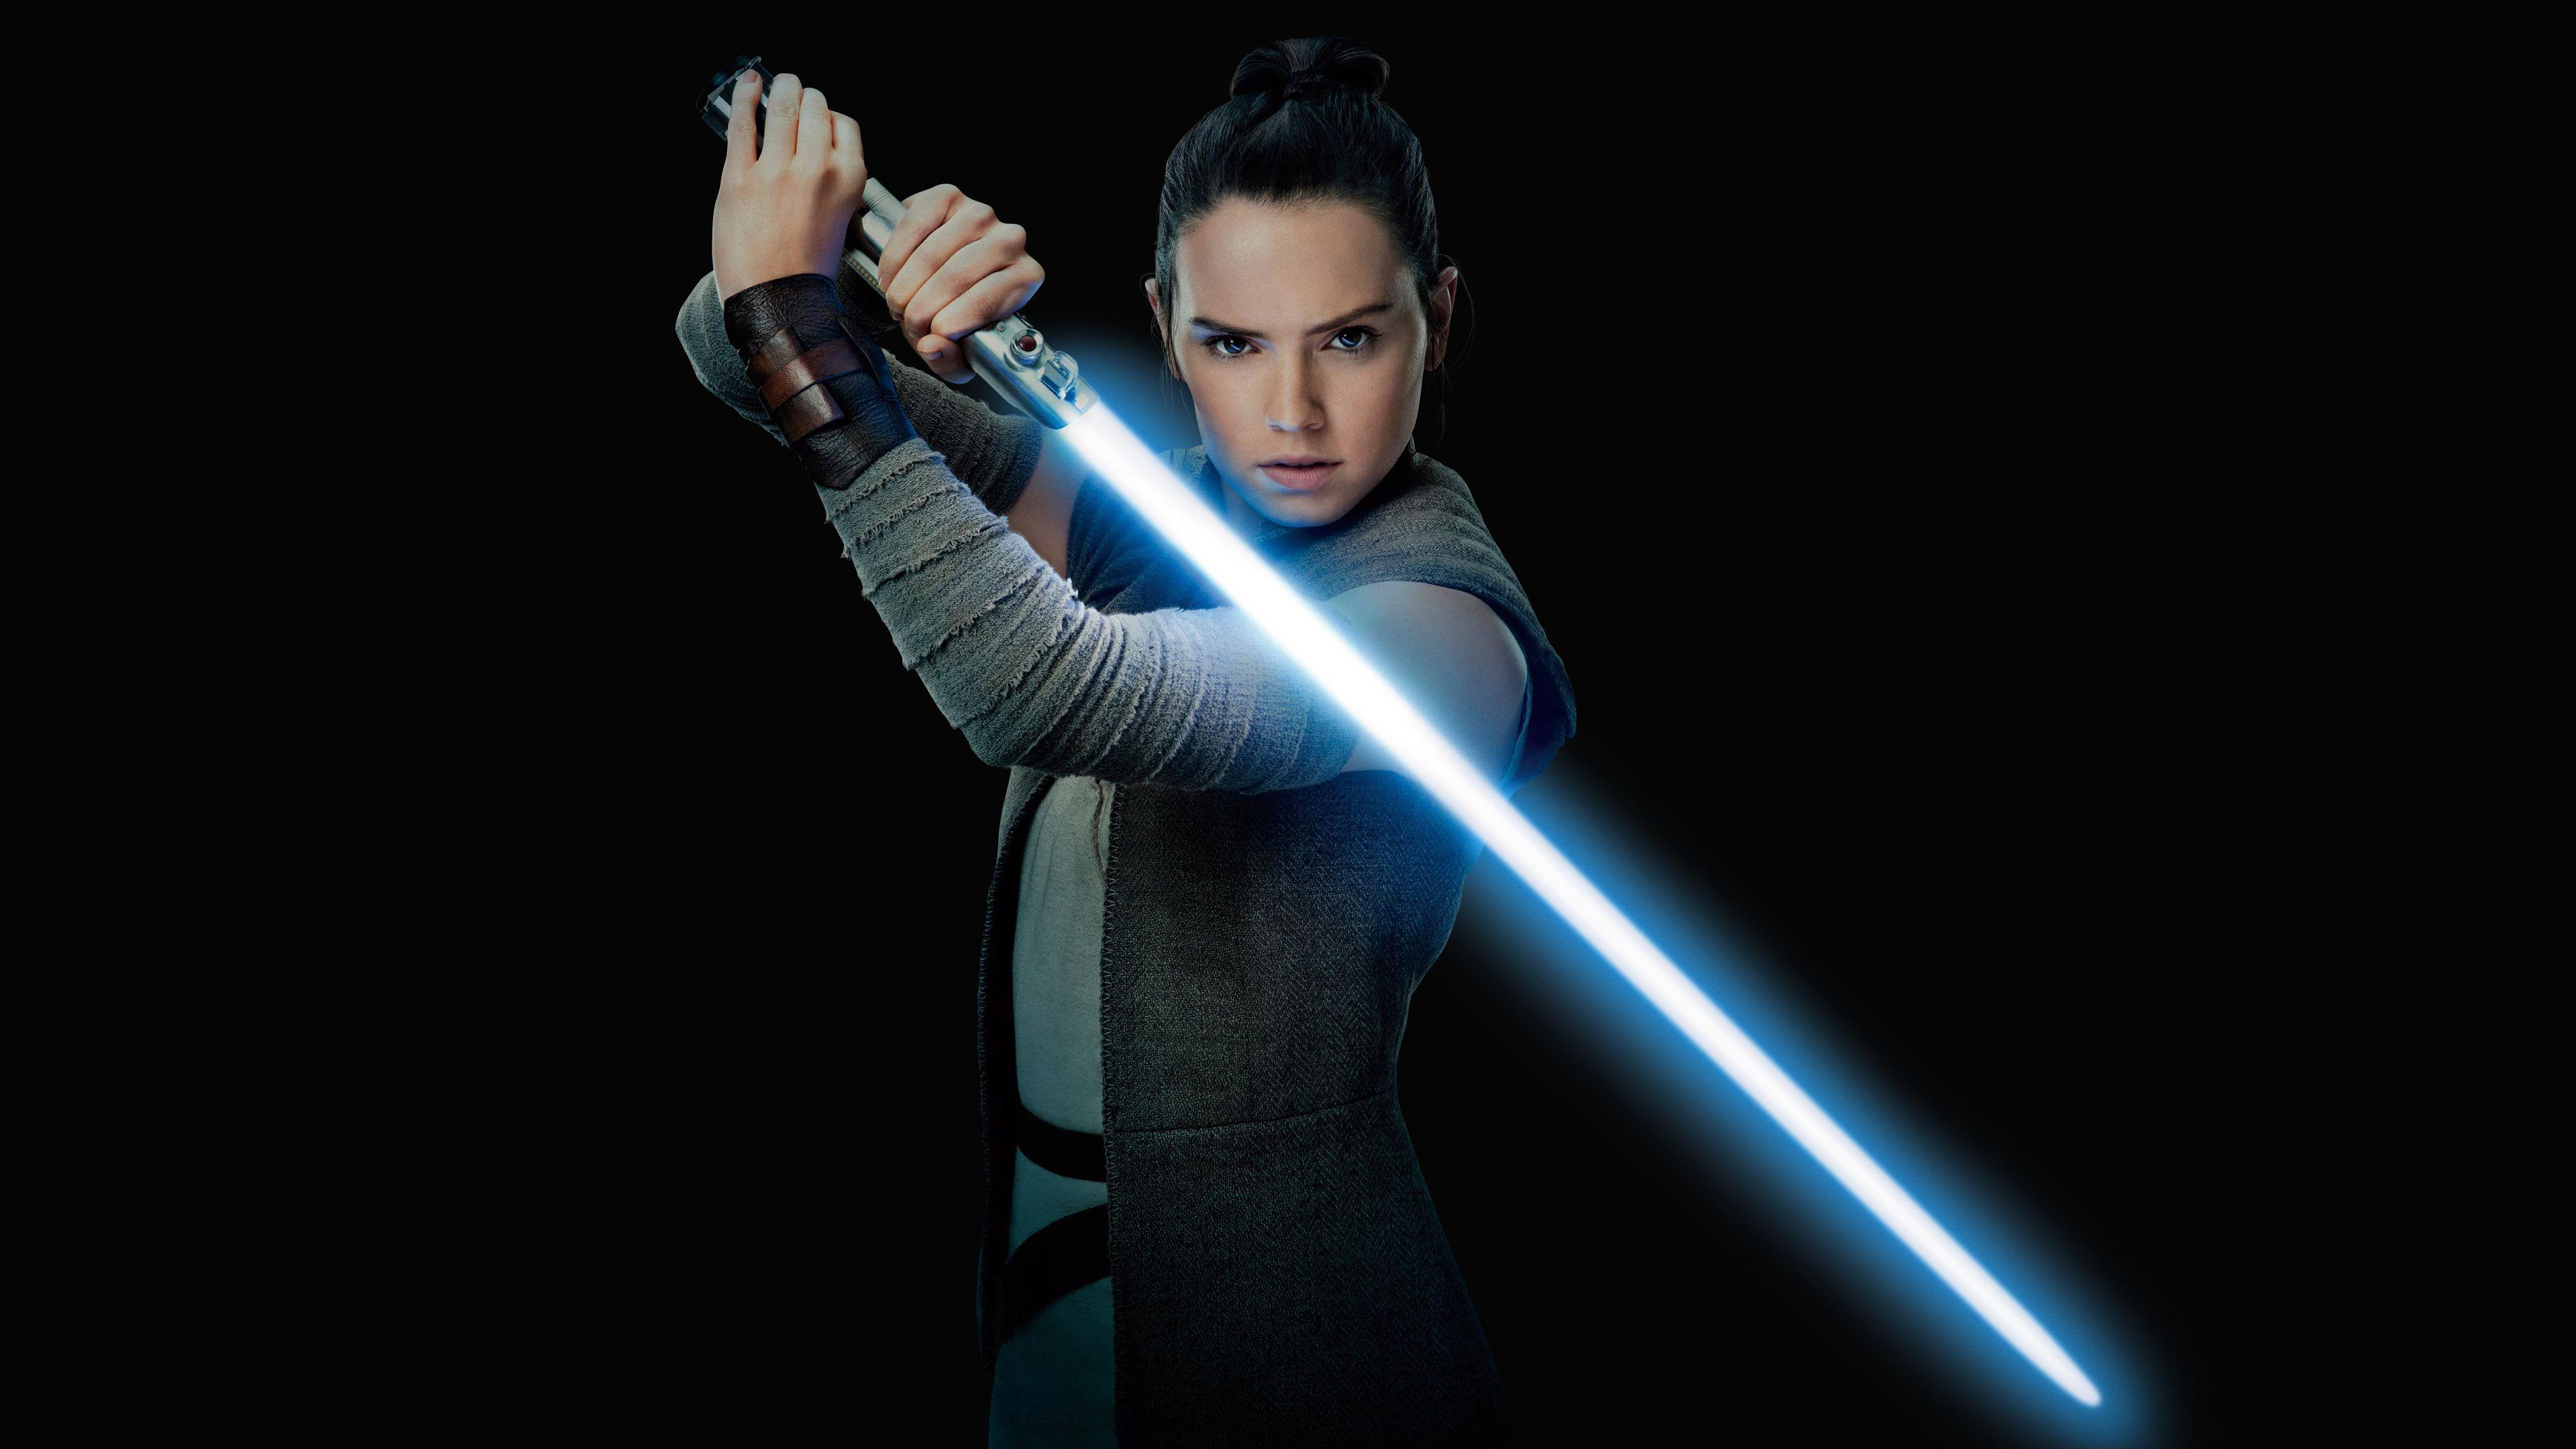 Rey Star Wars Wallpapers 1080p Rey Star Wars Daisy Ridley Star Wars Star Wars Wallpaper